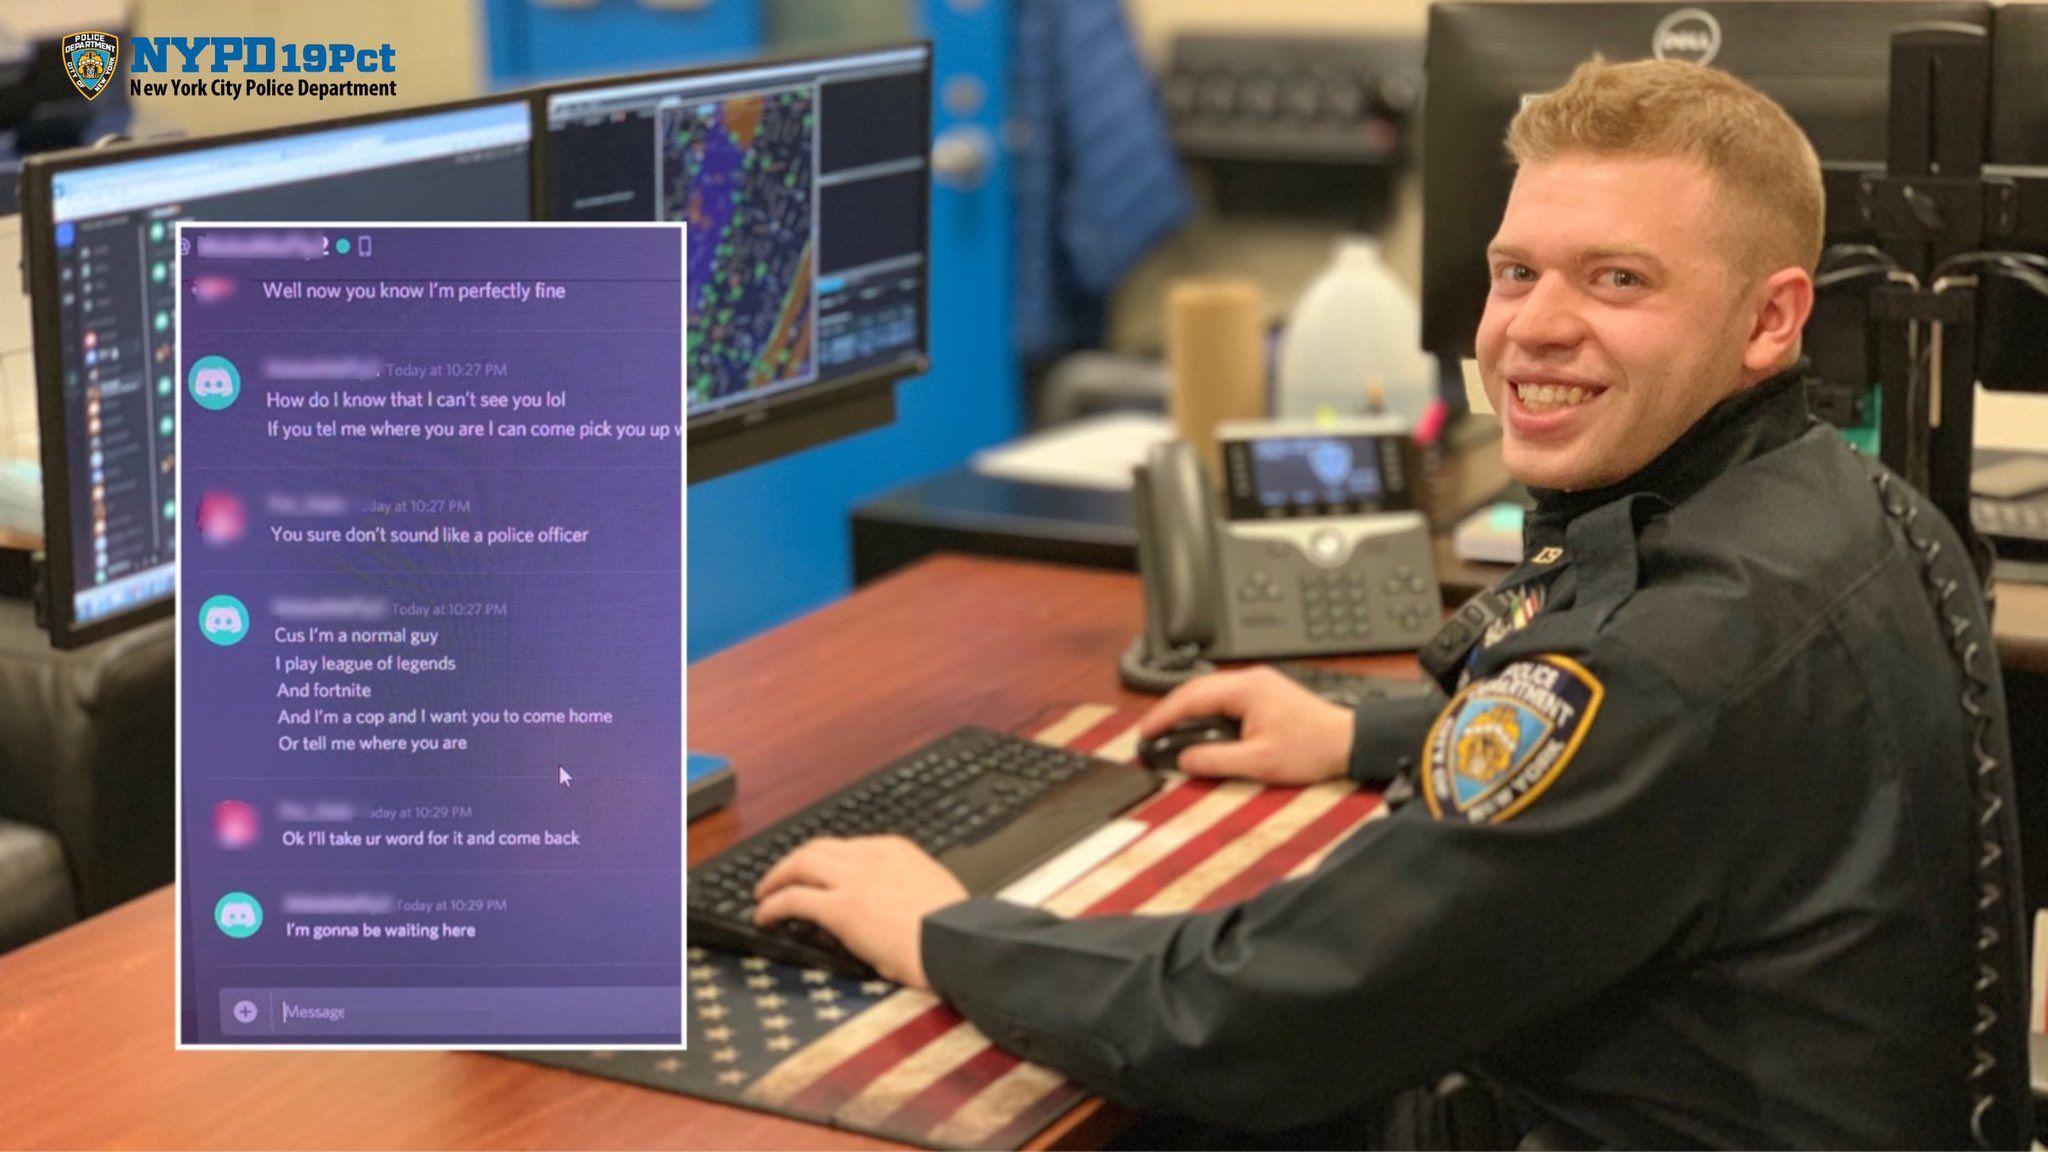 NYPD 19th Precinct on Game app, To catch a predator, I